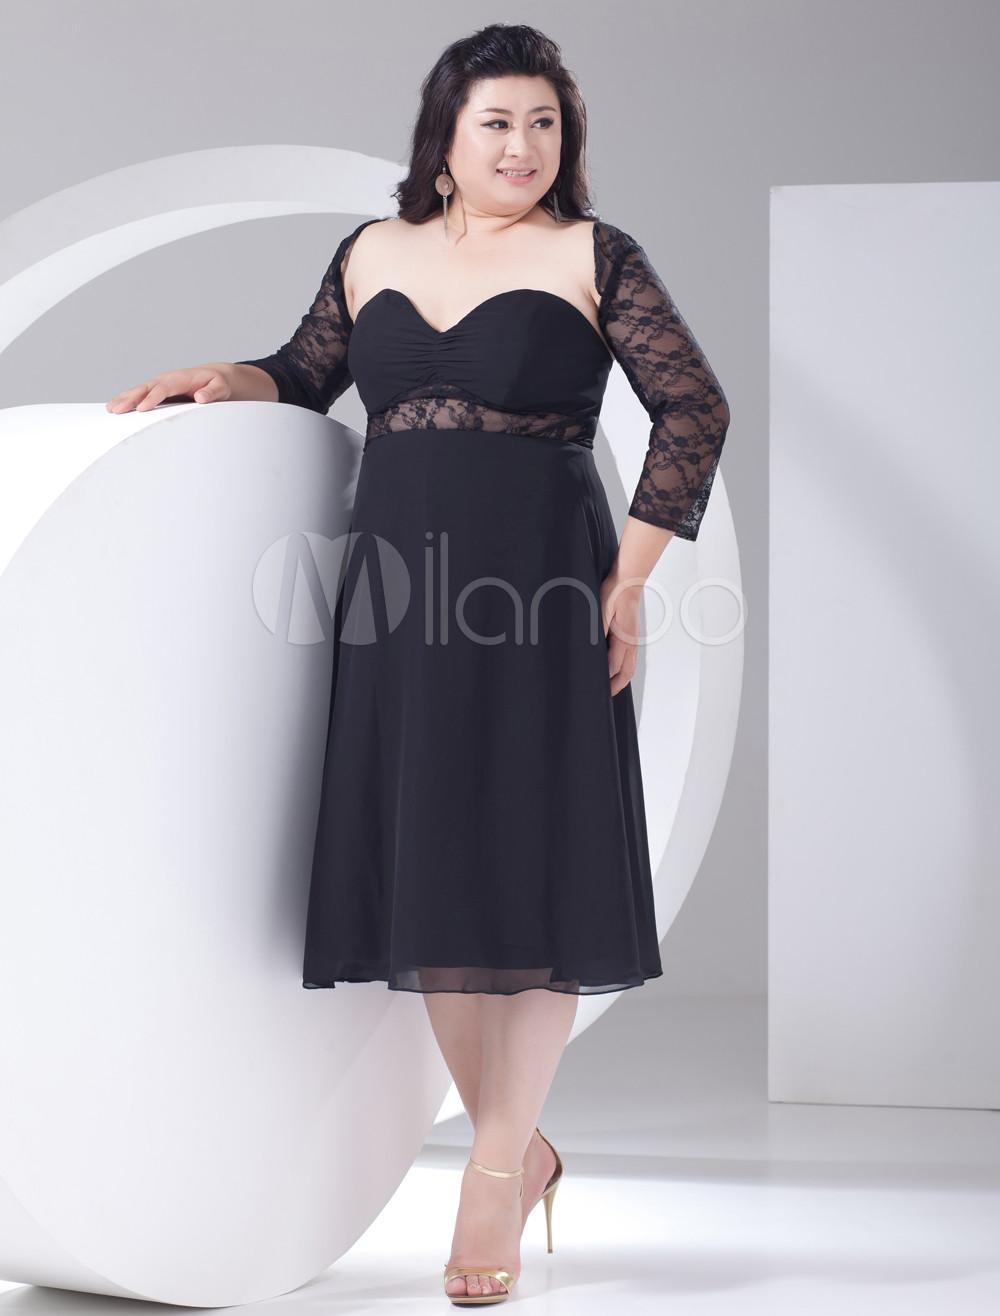 2013 Style Black Lace Cut Out Half-Sleeve Plus Size Cocktail Dress